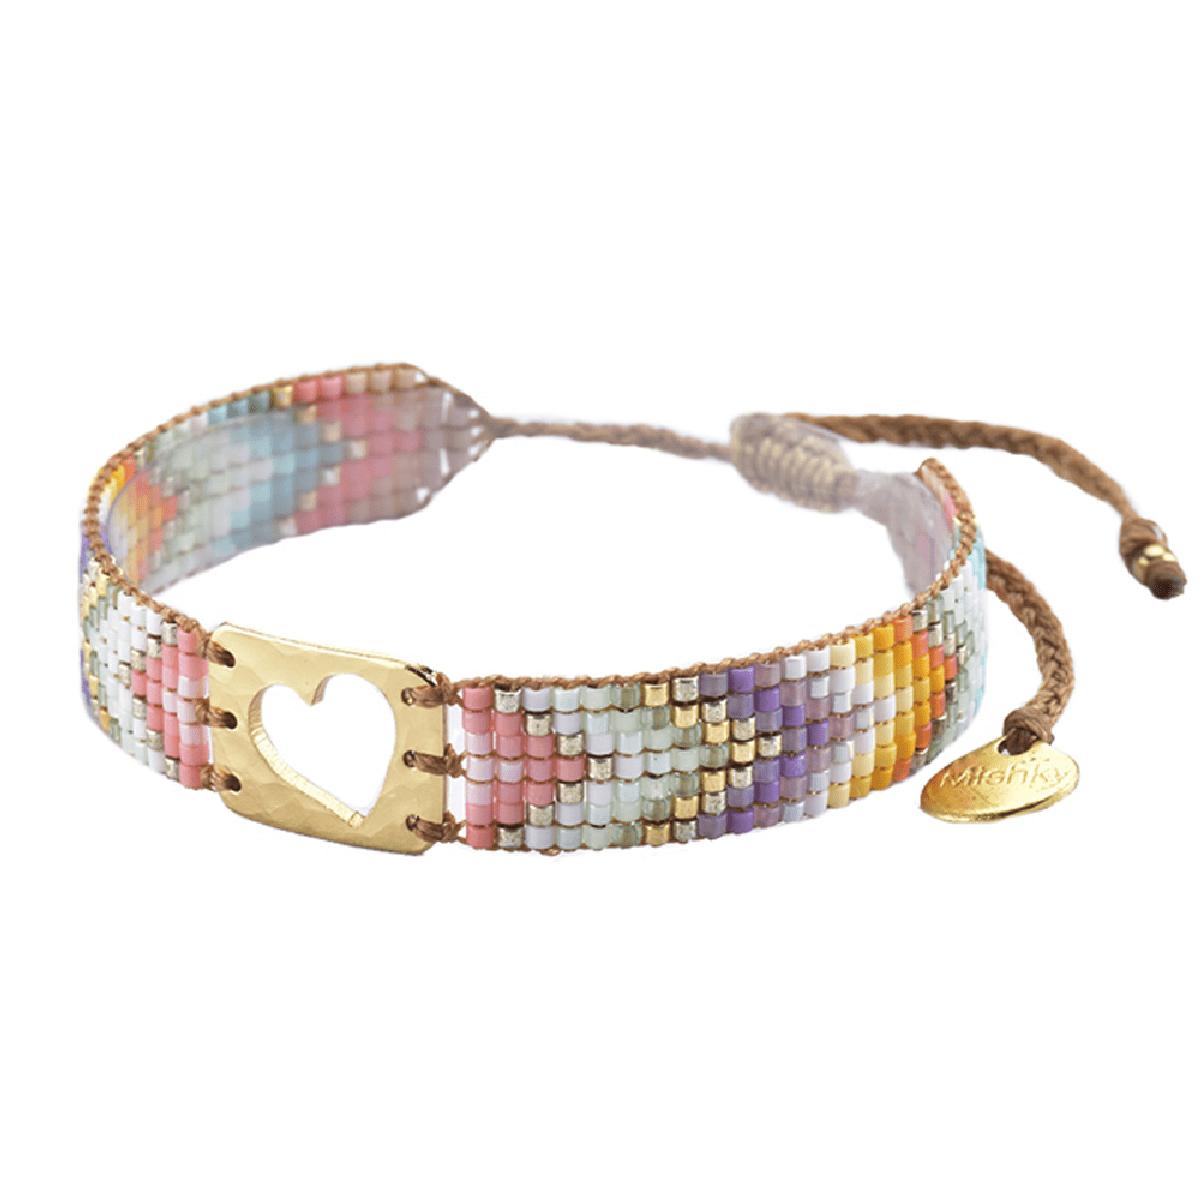 MISHKY, Bracelet Mini Heart en perles multicolores or, violet, orange & blanc - cassisroyal.com